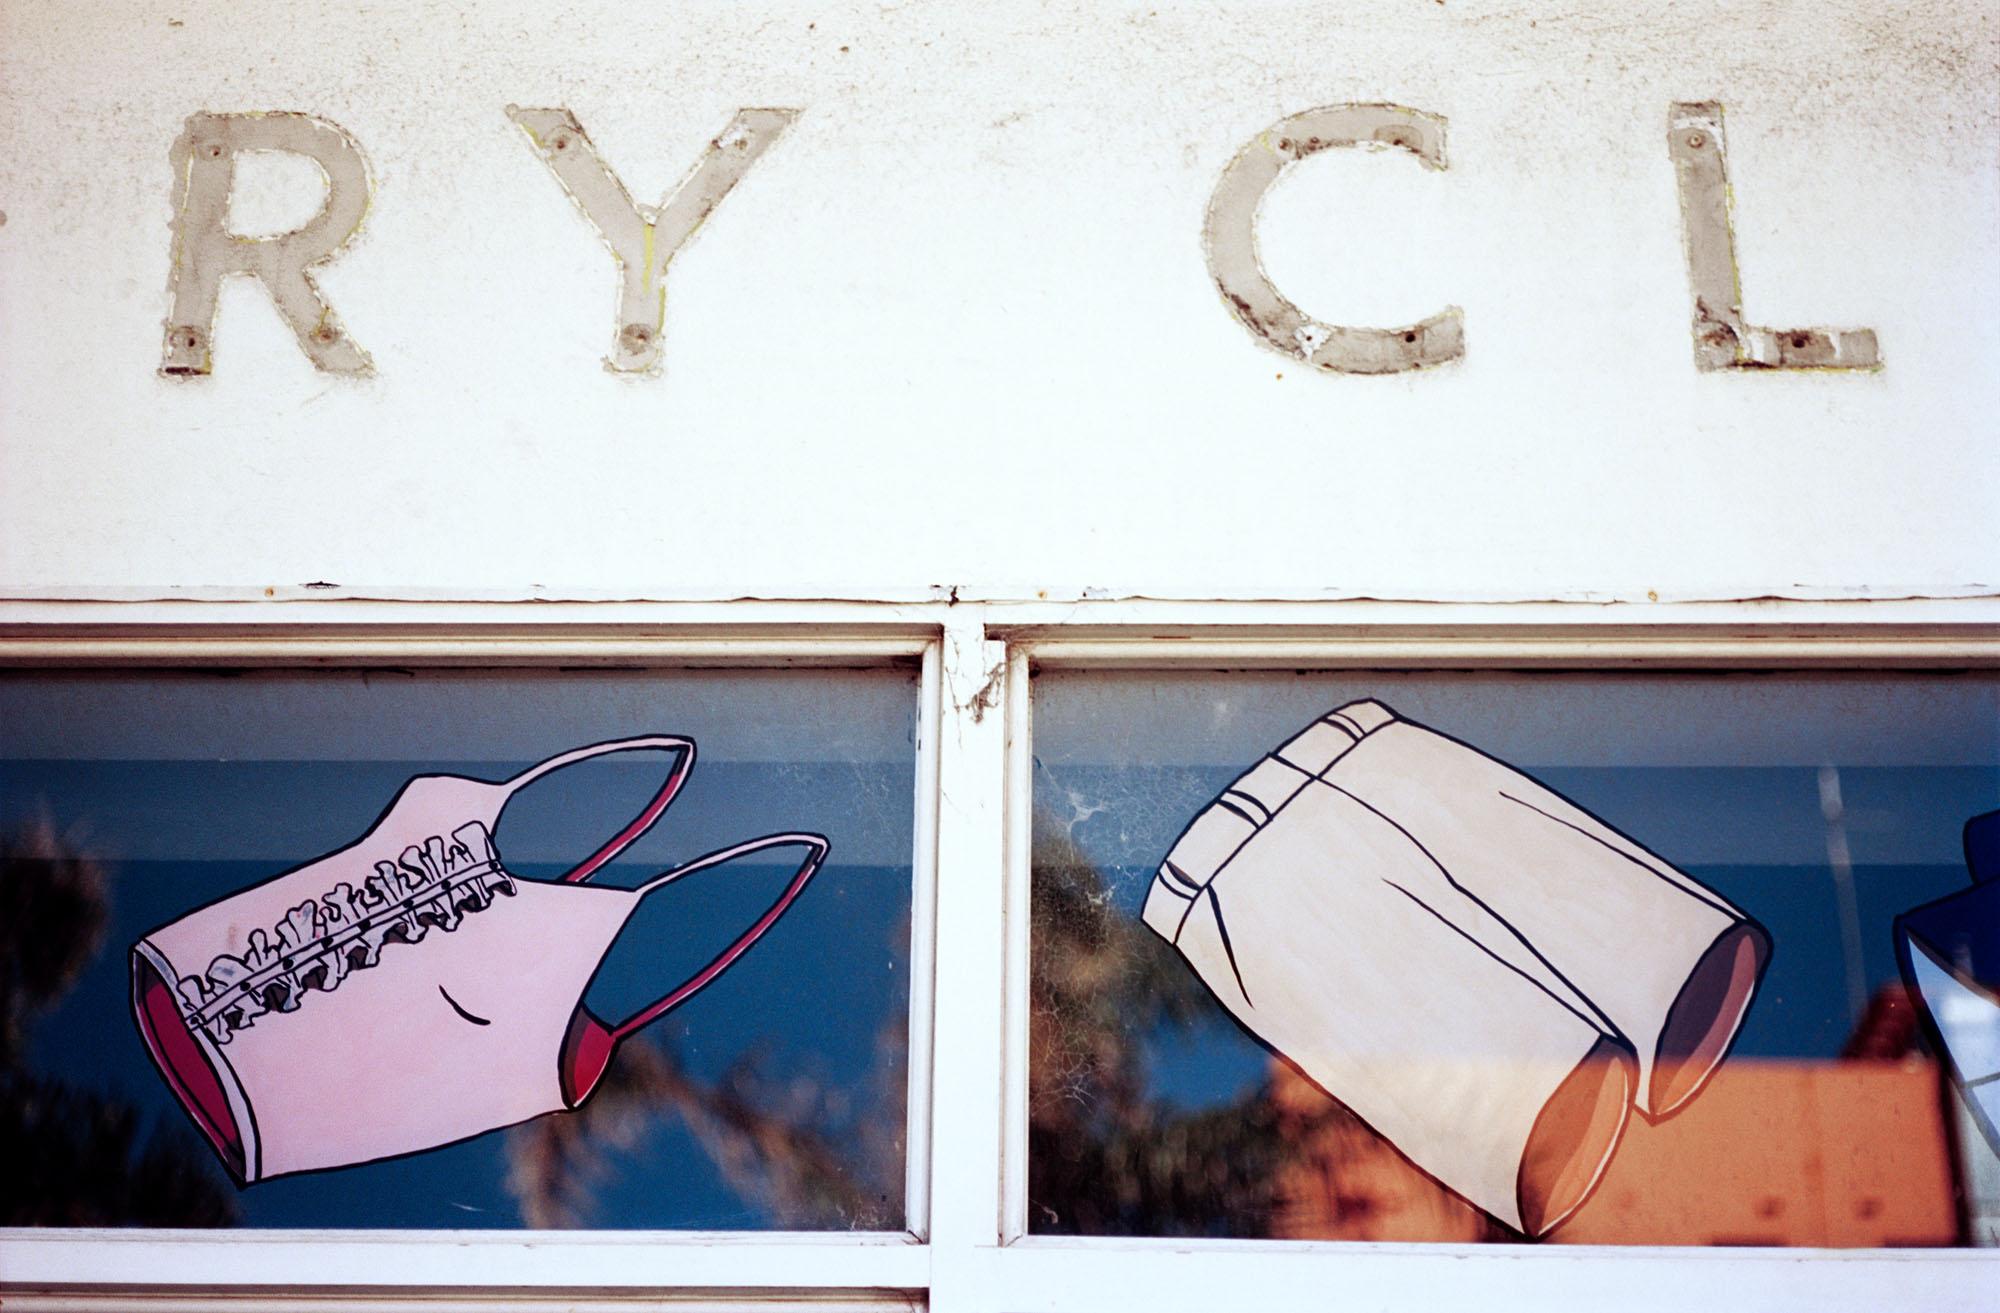 dry cleaners.jpg